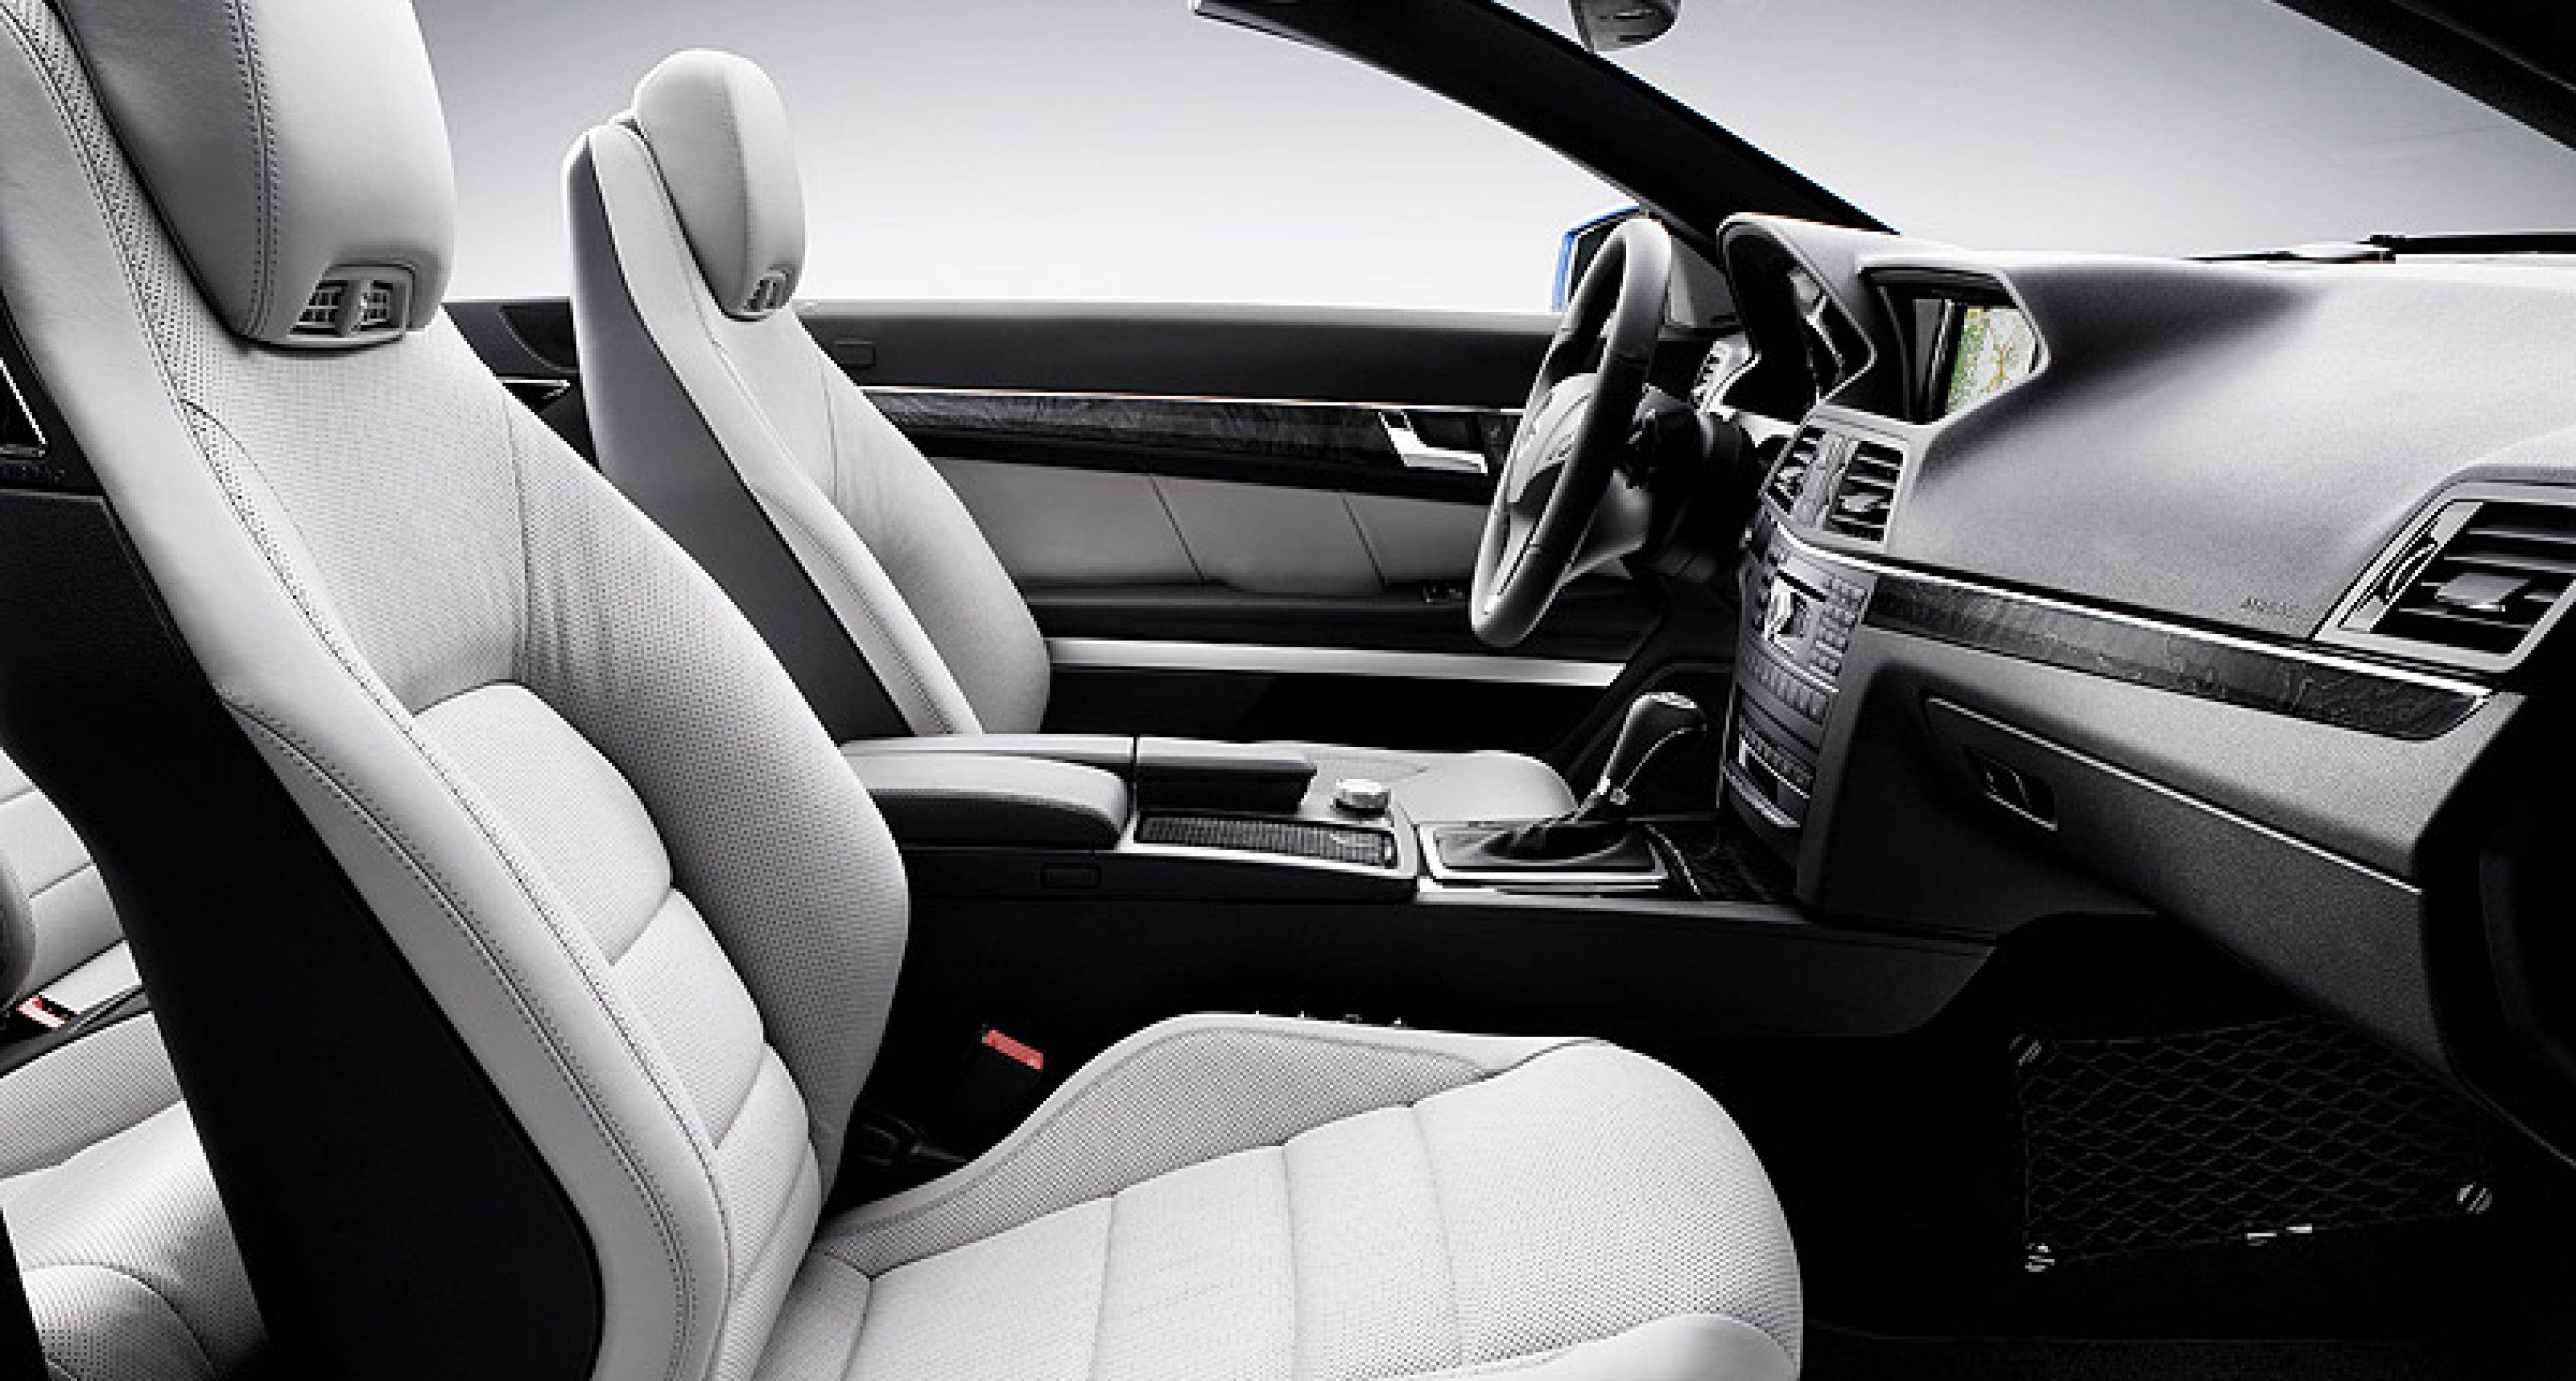 Mercedes-Benz E-Class Cabriolet